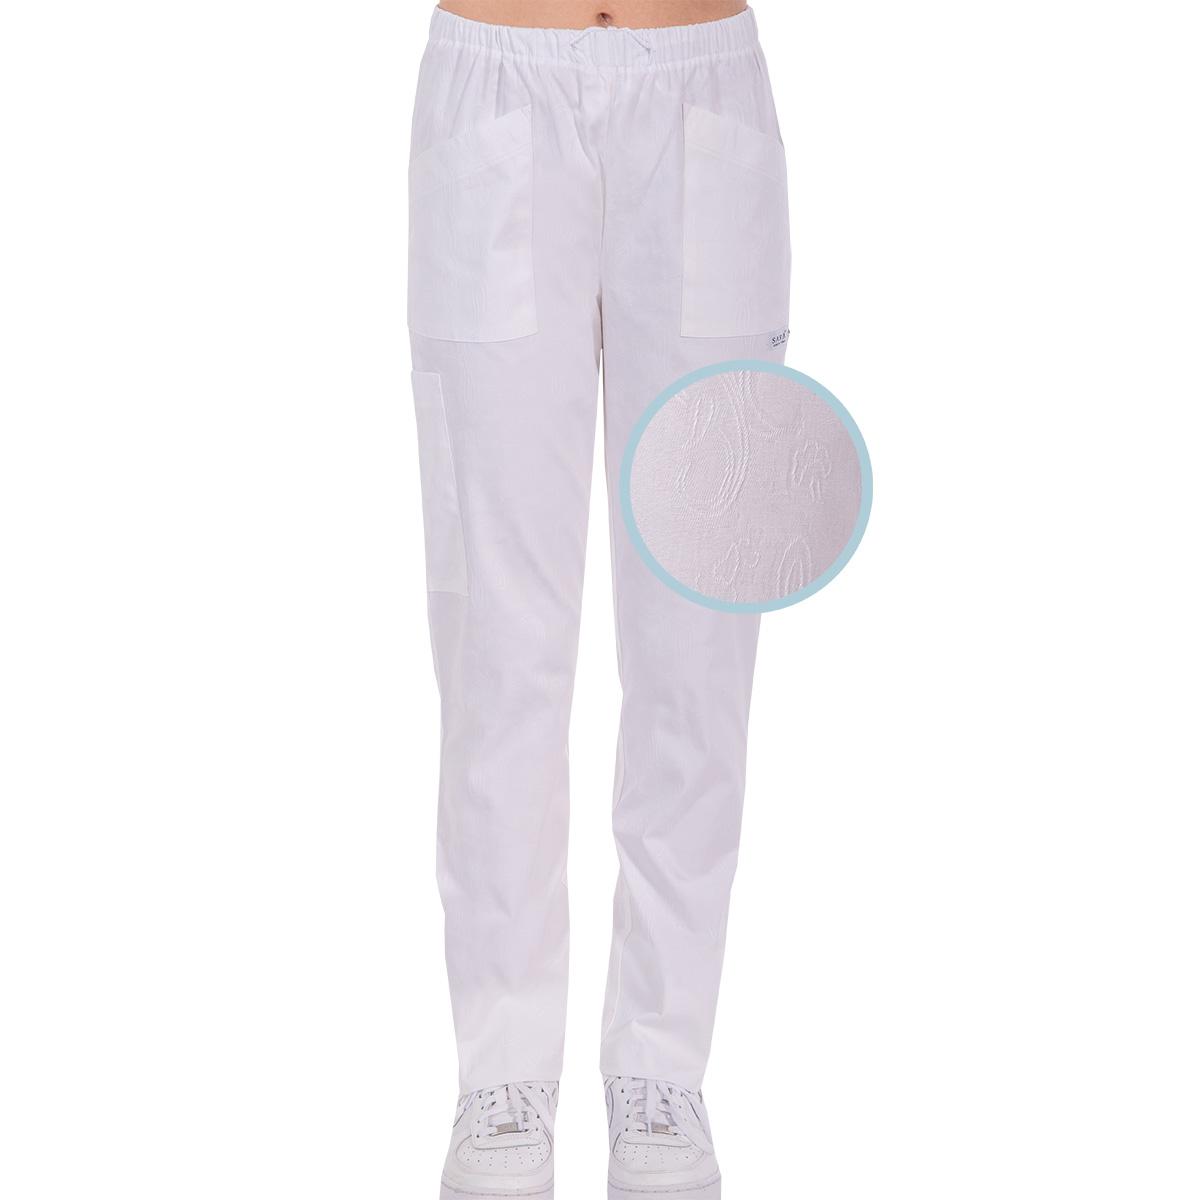 pantalone-bianco-estetista-sara-creazioni